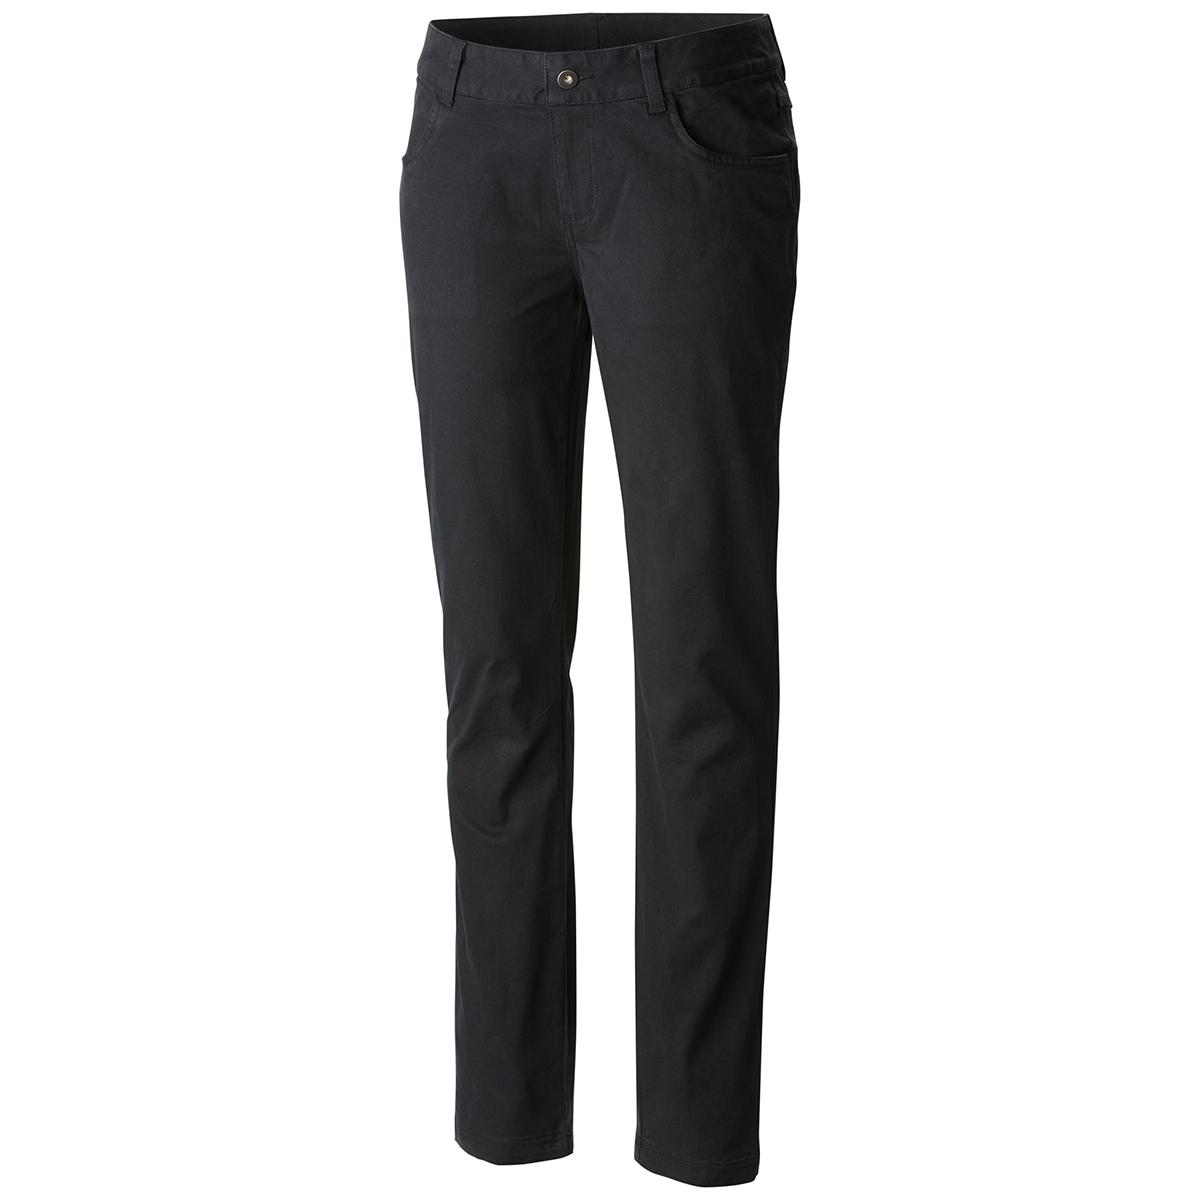 Columbia Women's Sellwood Pants - Black, 10